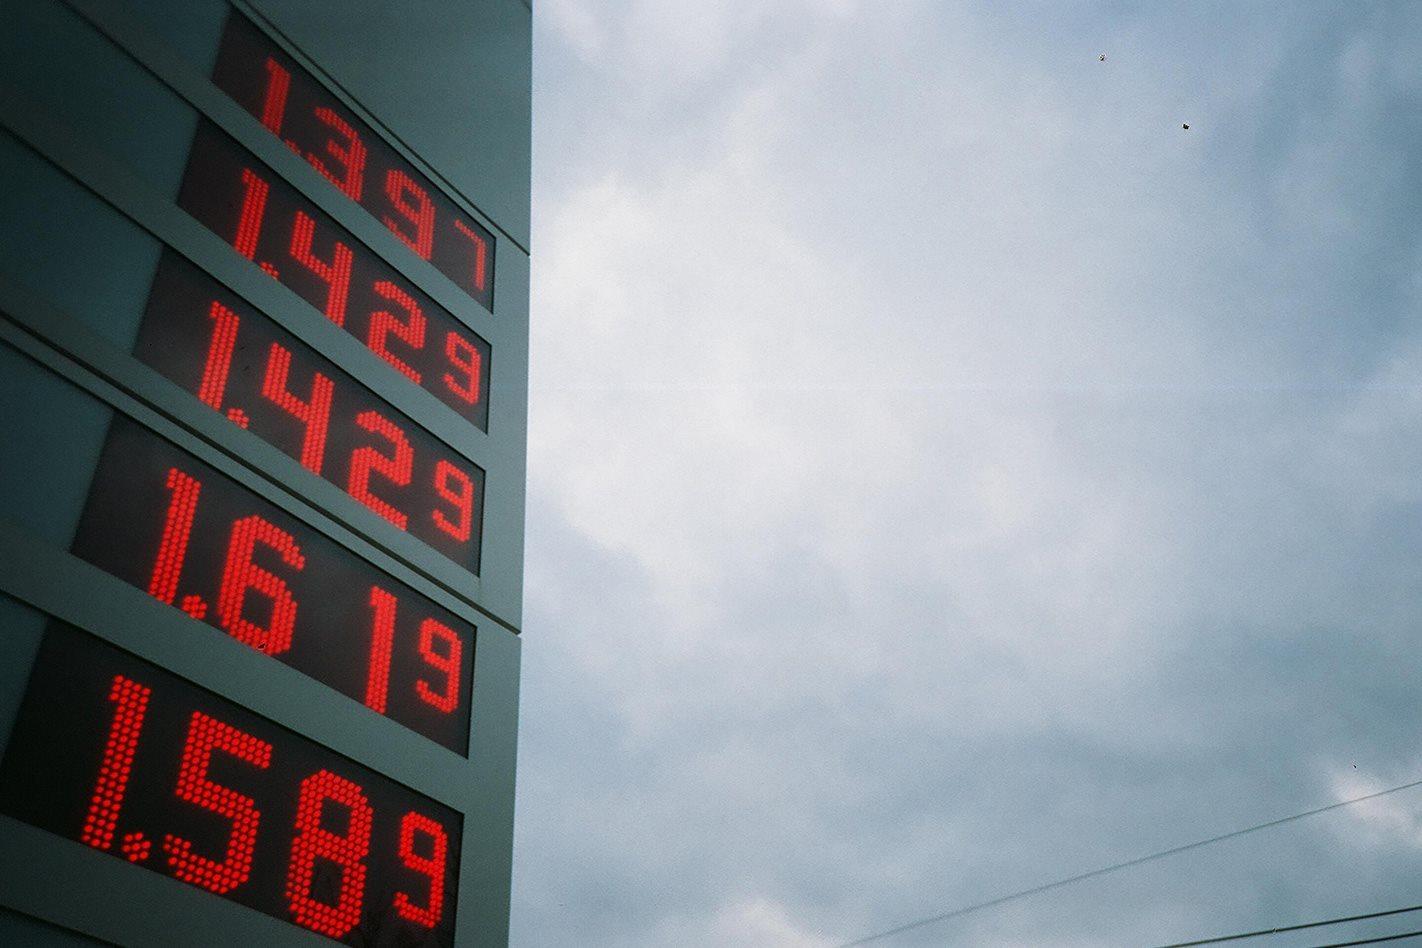 high-octane fuel prices